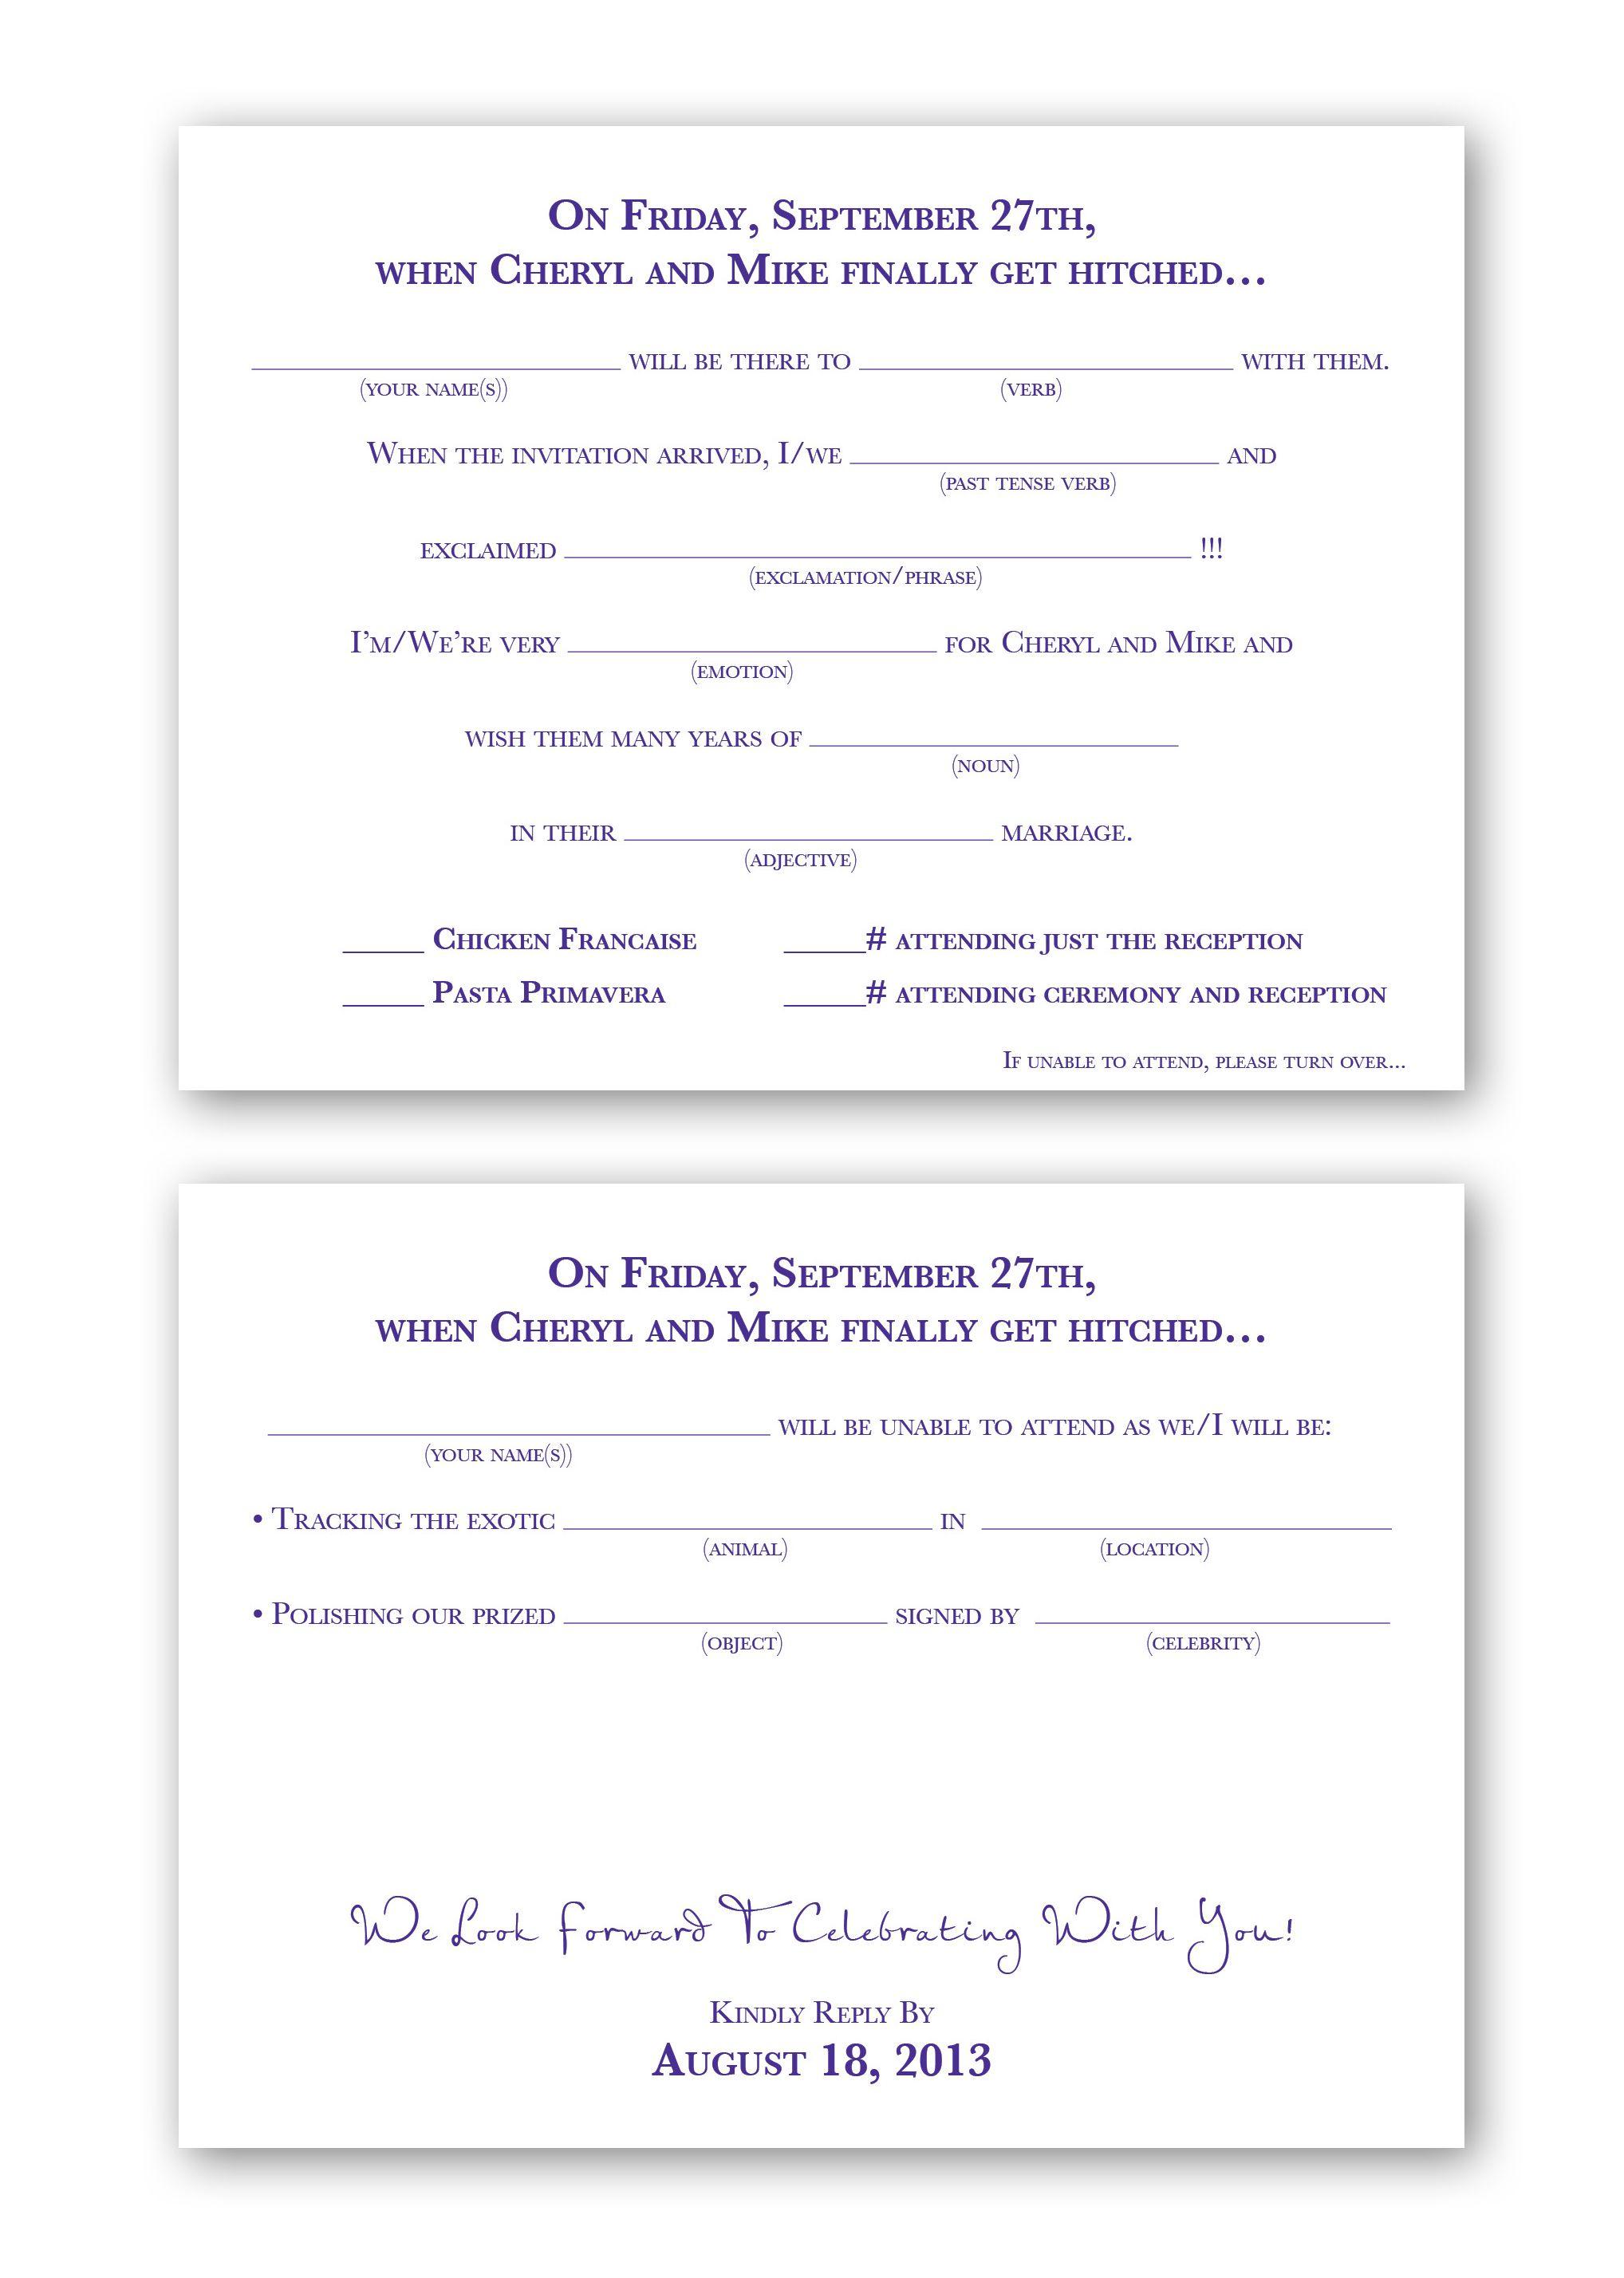 Mad Libs Wedding Reply Card | Kasey | Pinterest | Wedding reply ...